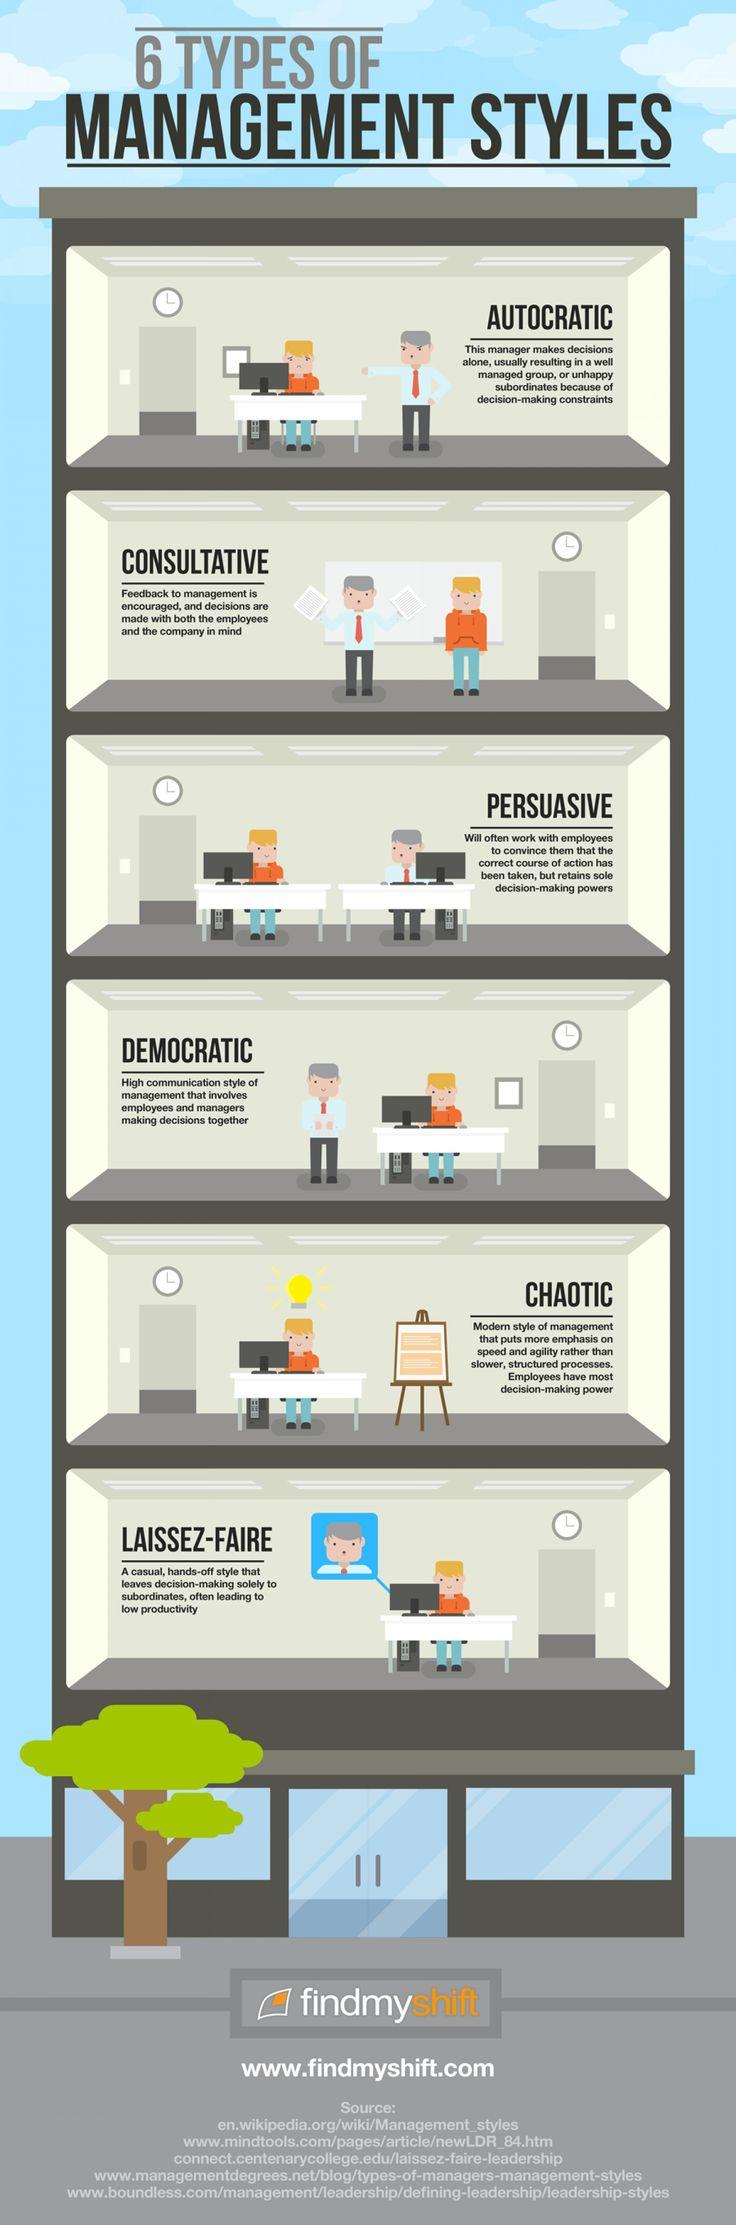 3 management styles